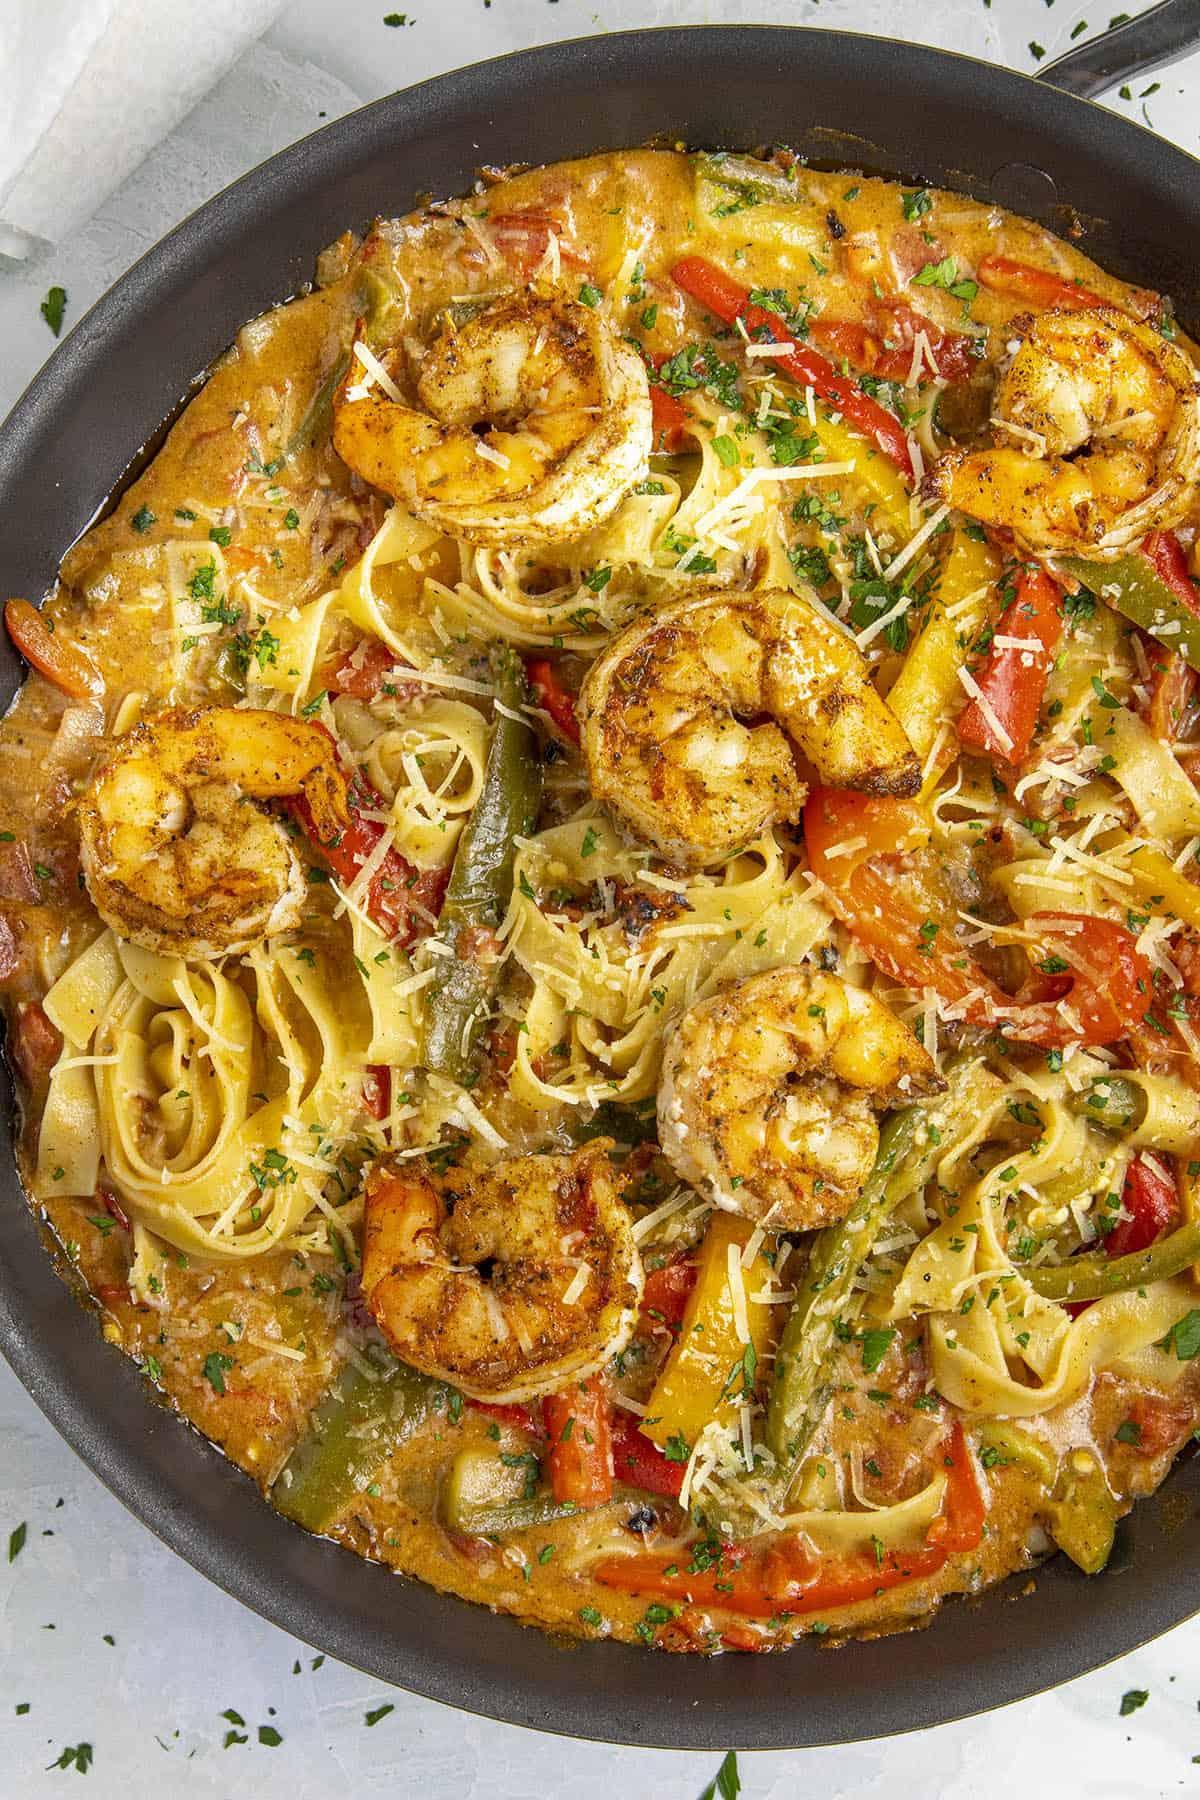 Rasta Pasta with shrimp in a pan